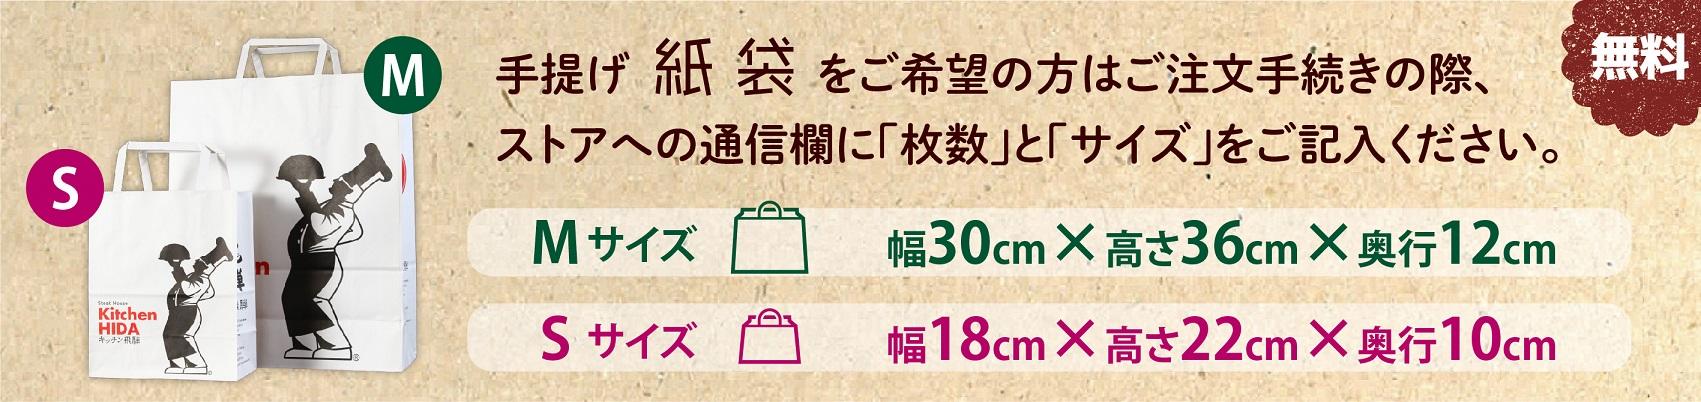 fs-kamibukuro.jpg